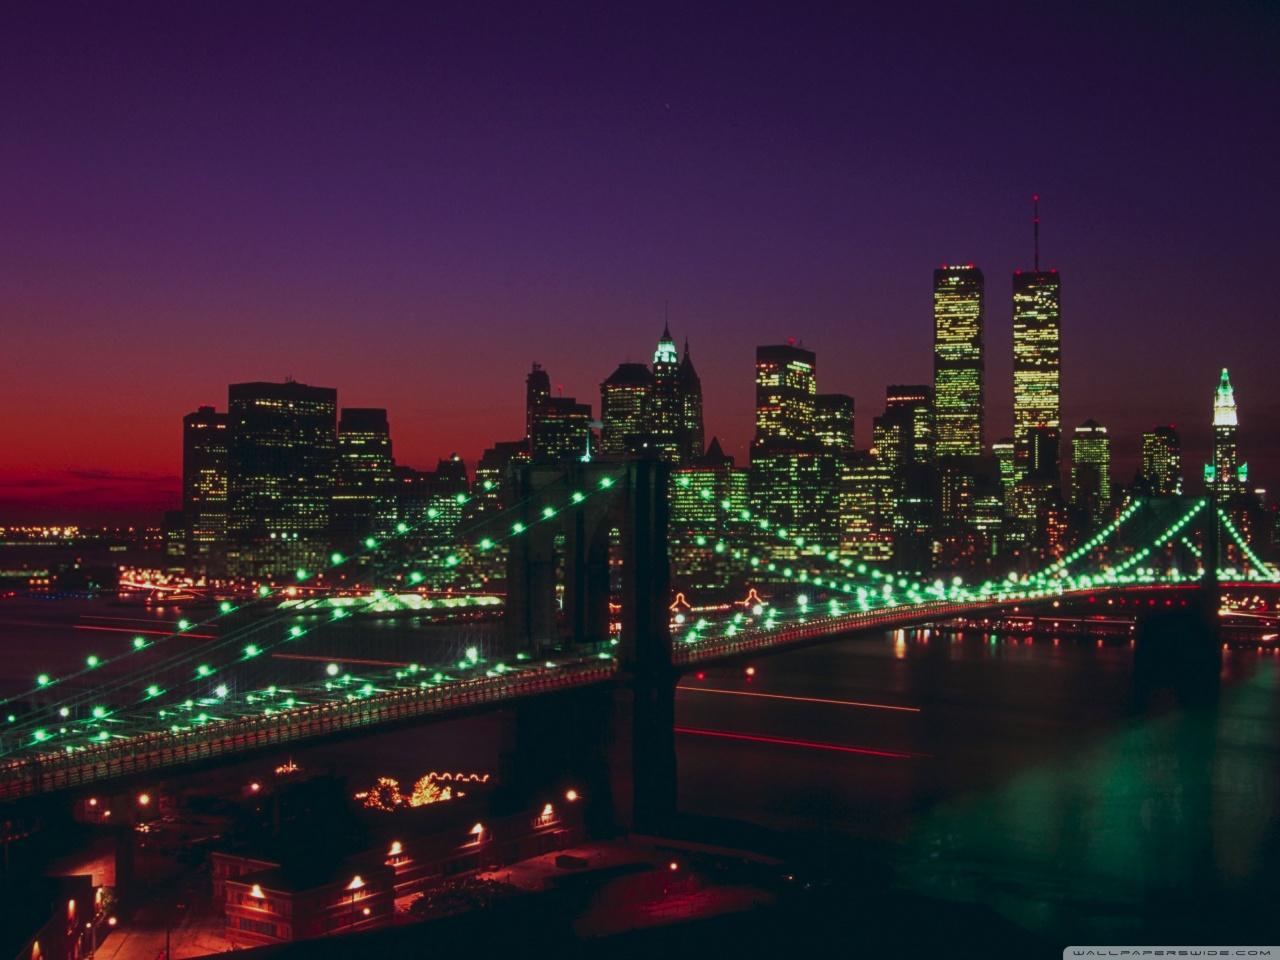 Download Wallpaper Hp 3d Brooklyn Bridge New York 4k Hd Desktop Wallpaper For 4k